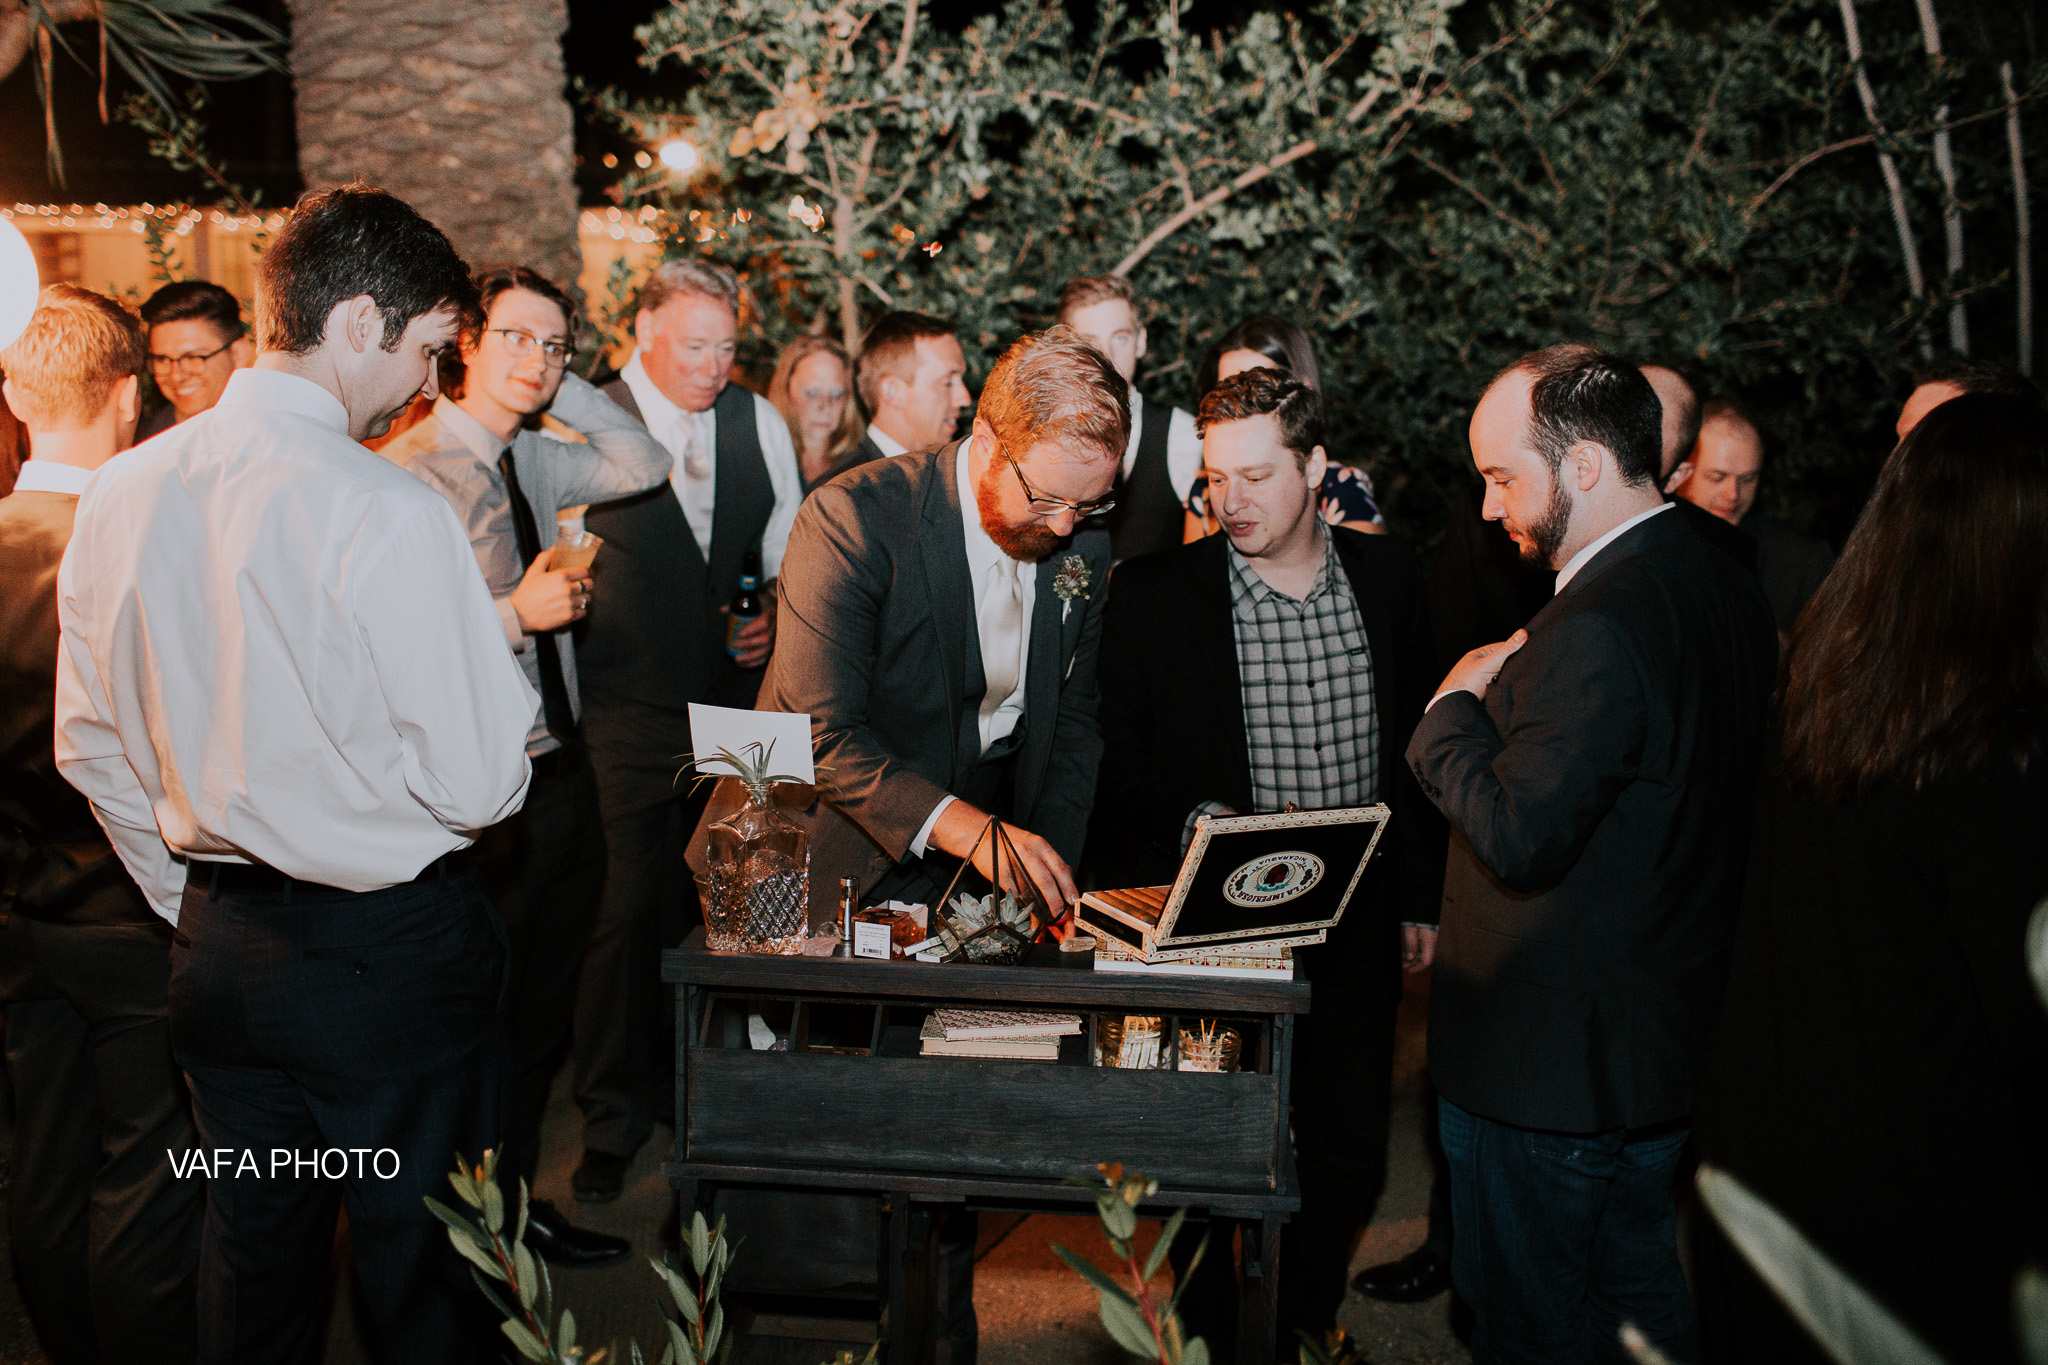 Leo-Carrillo-Ranch-Wedding-Lauren-Mike-Vafa-Photo-1100.jpg